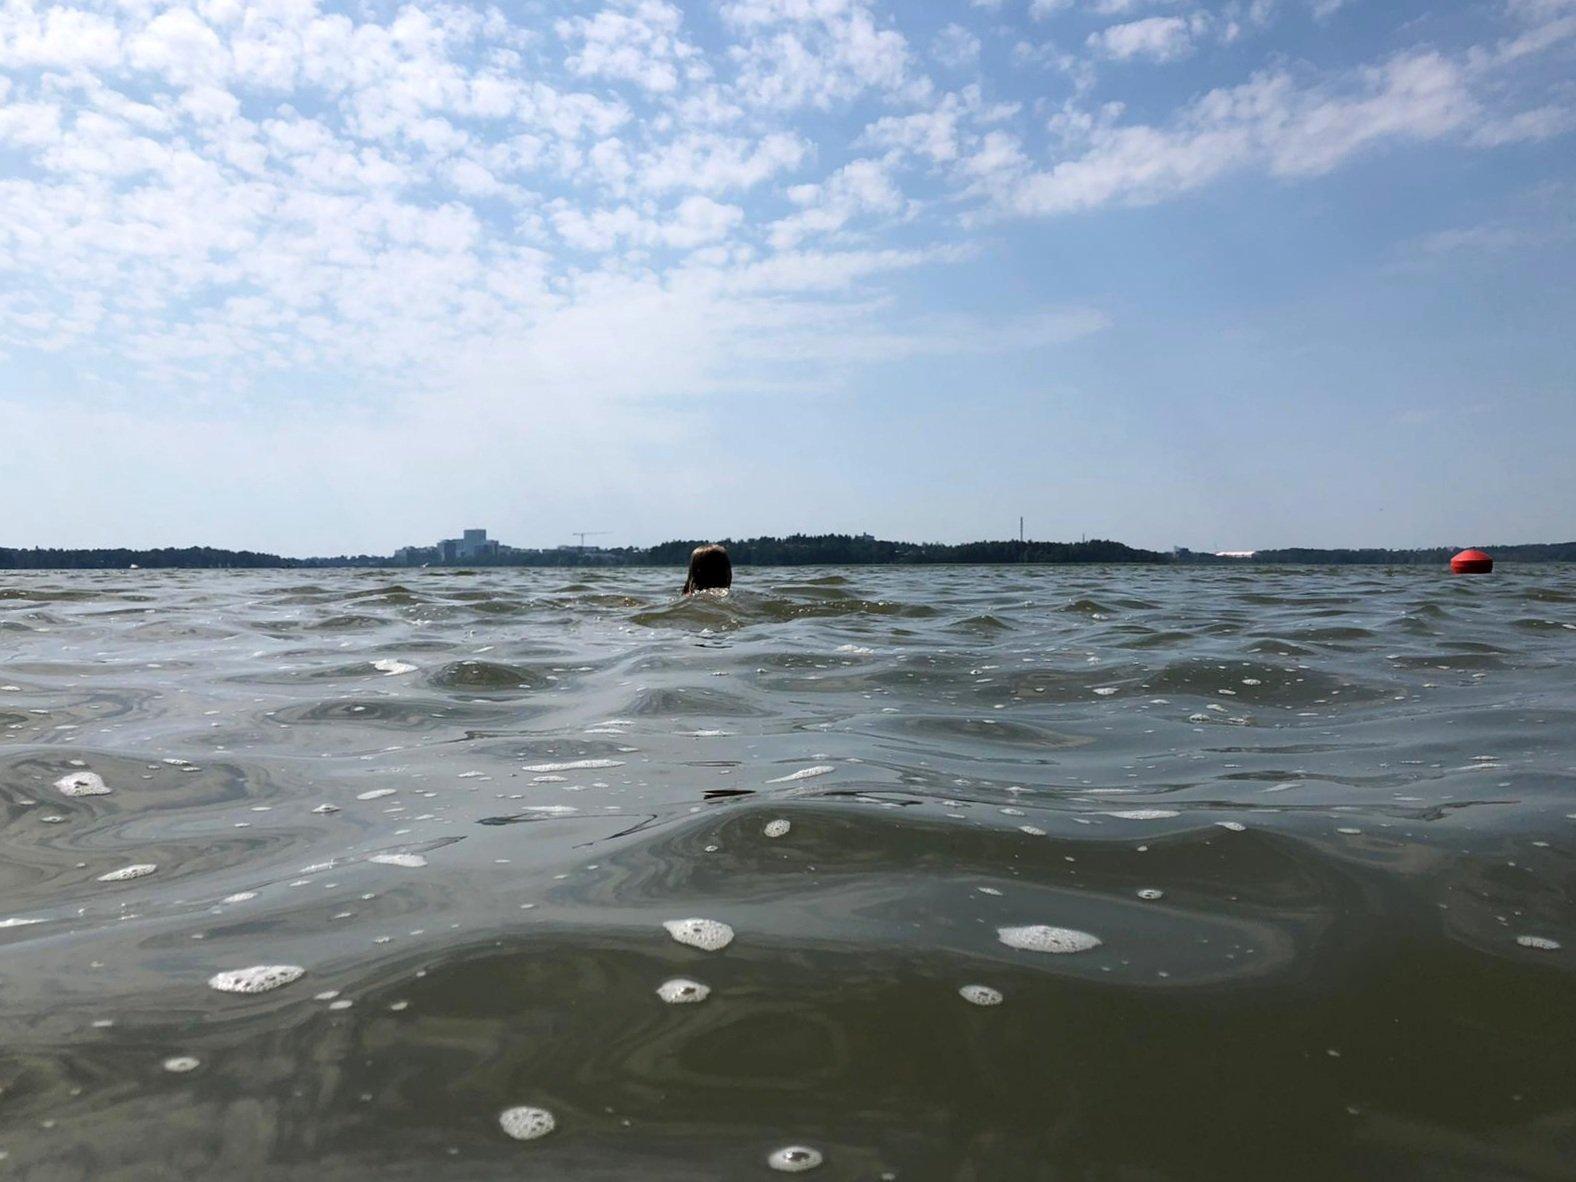 uimassa meressa